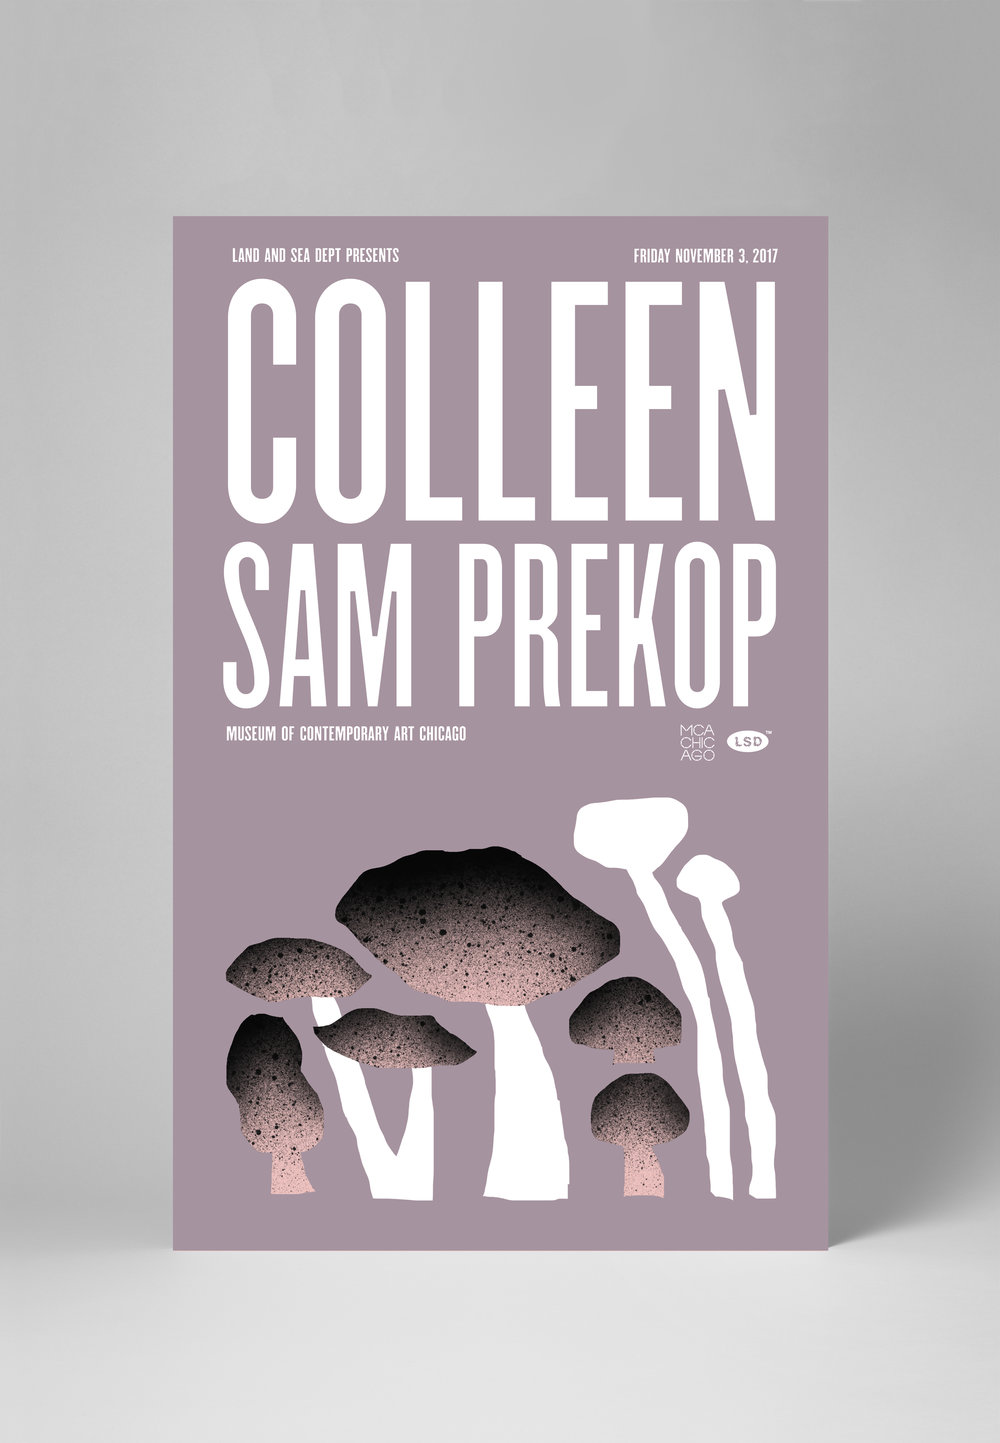 COLLEEN_SAM_POSTER_SM.jpg